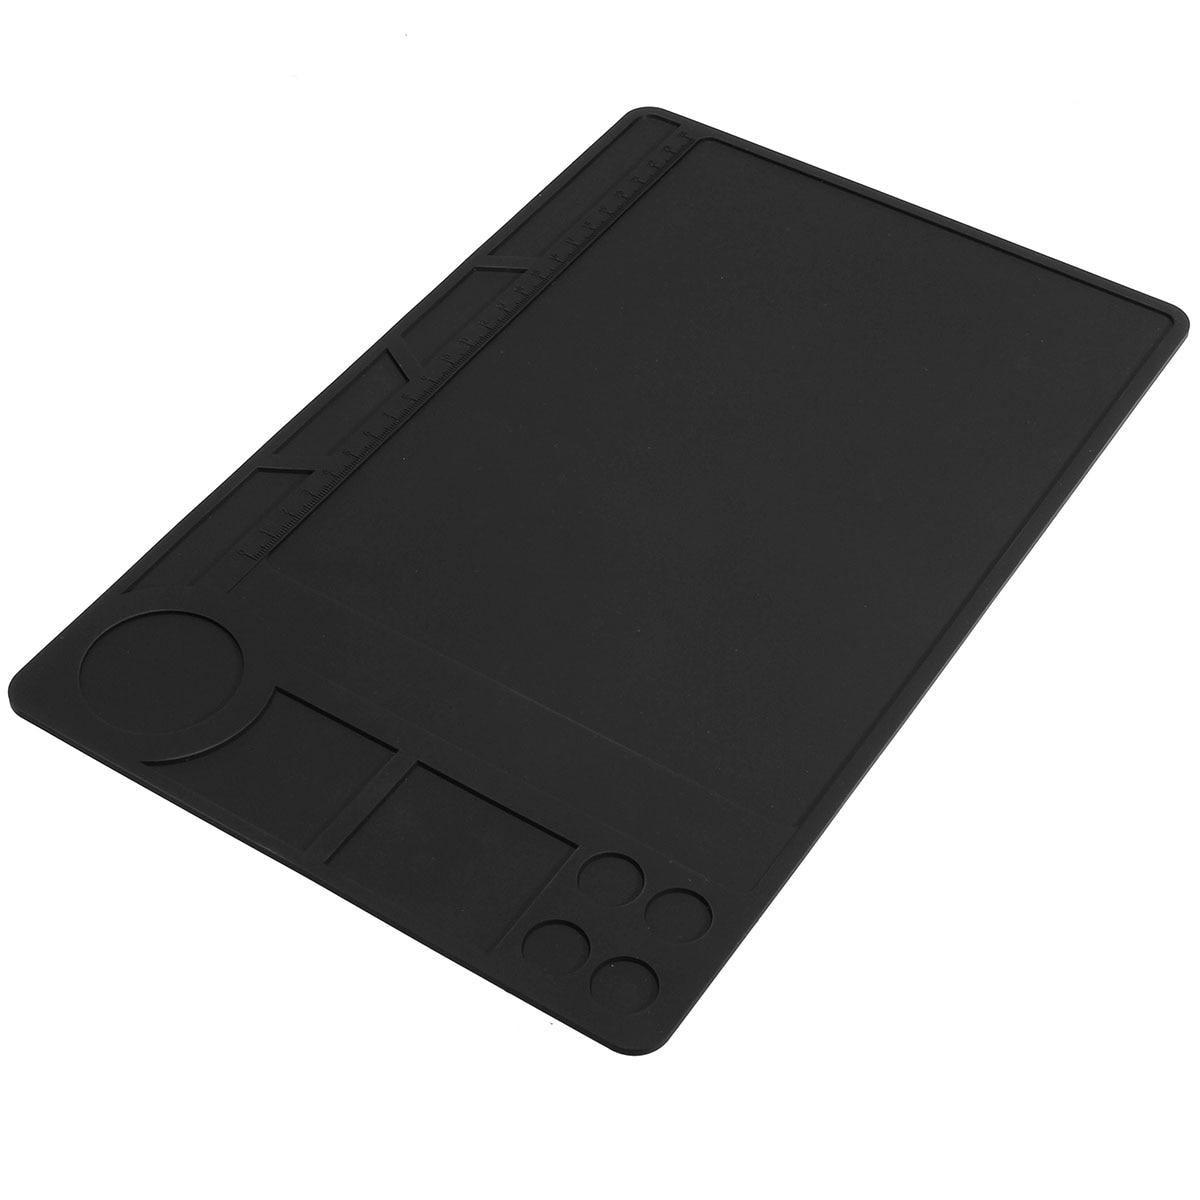 Hot Sale Heat Resistant Silicone Mat Soldering Pad Platform Heat BGA Soldering Station Repair 329x208mm Black